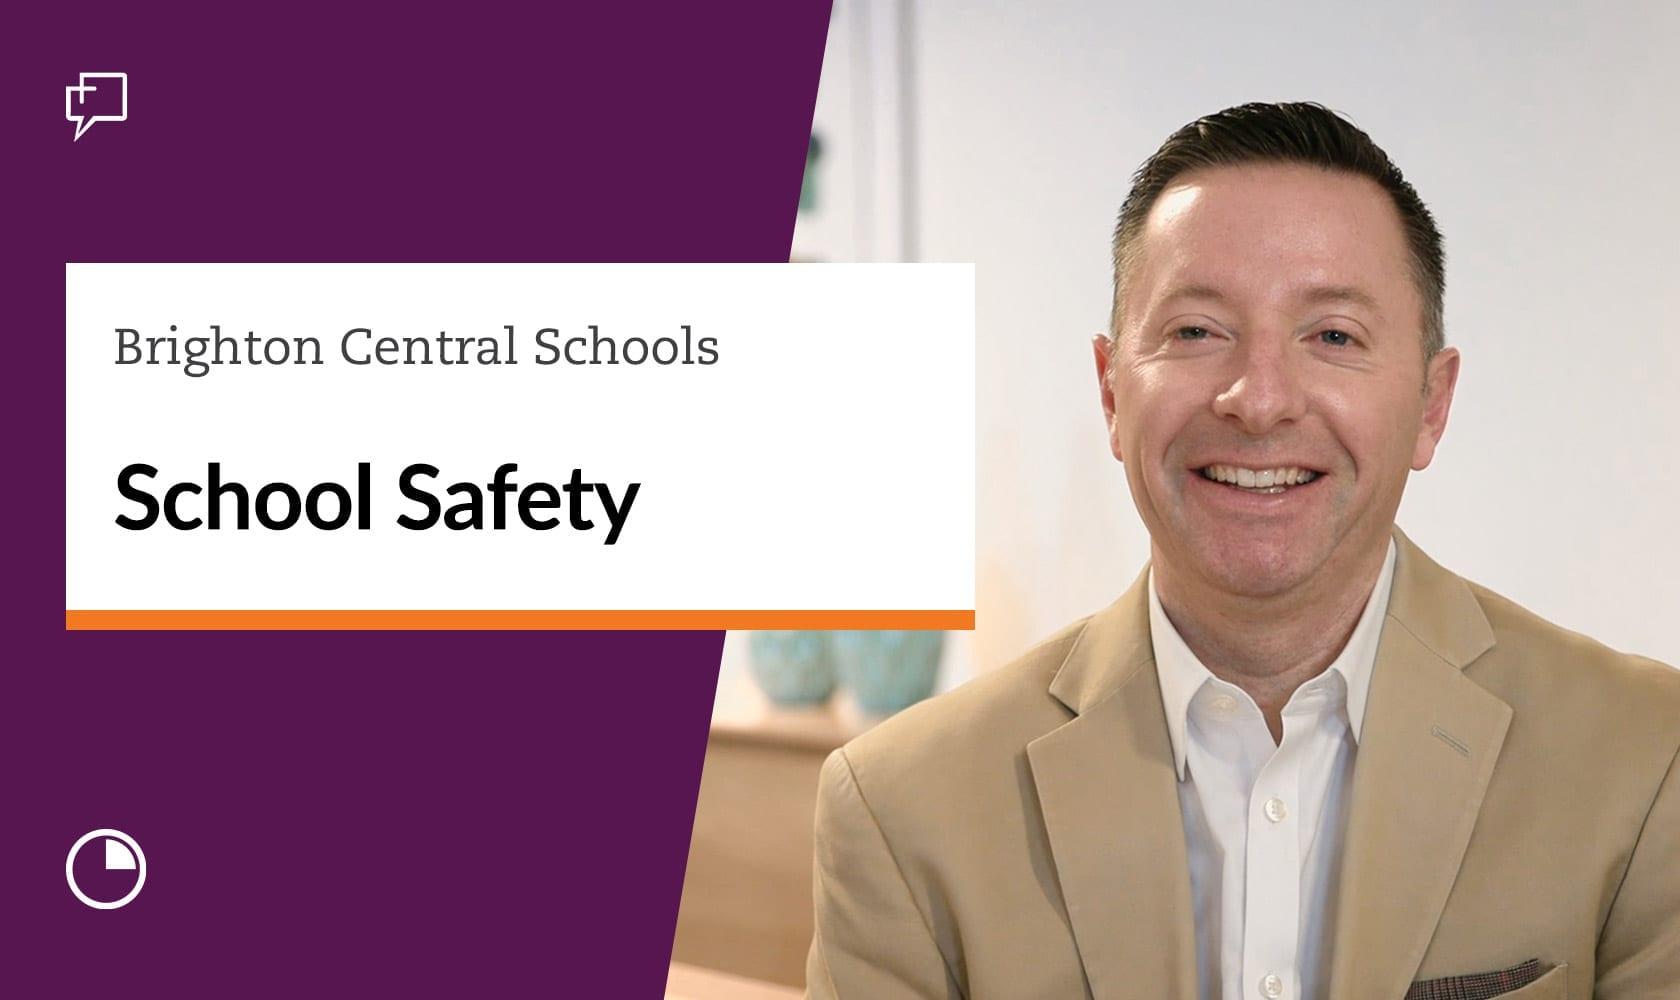 School Safety at Brighton